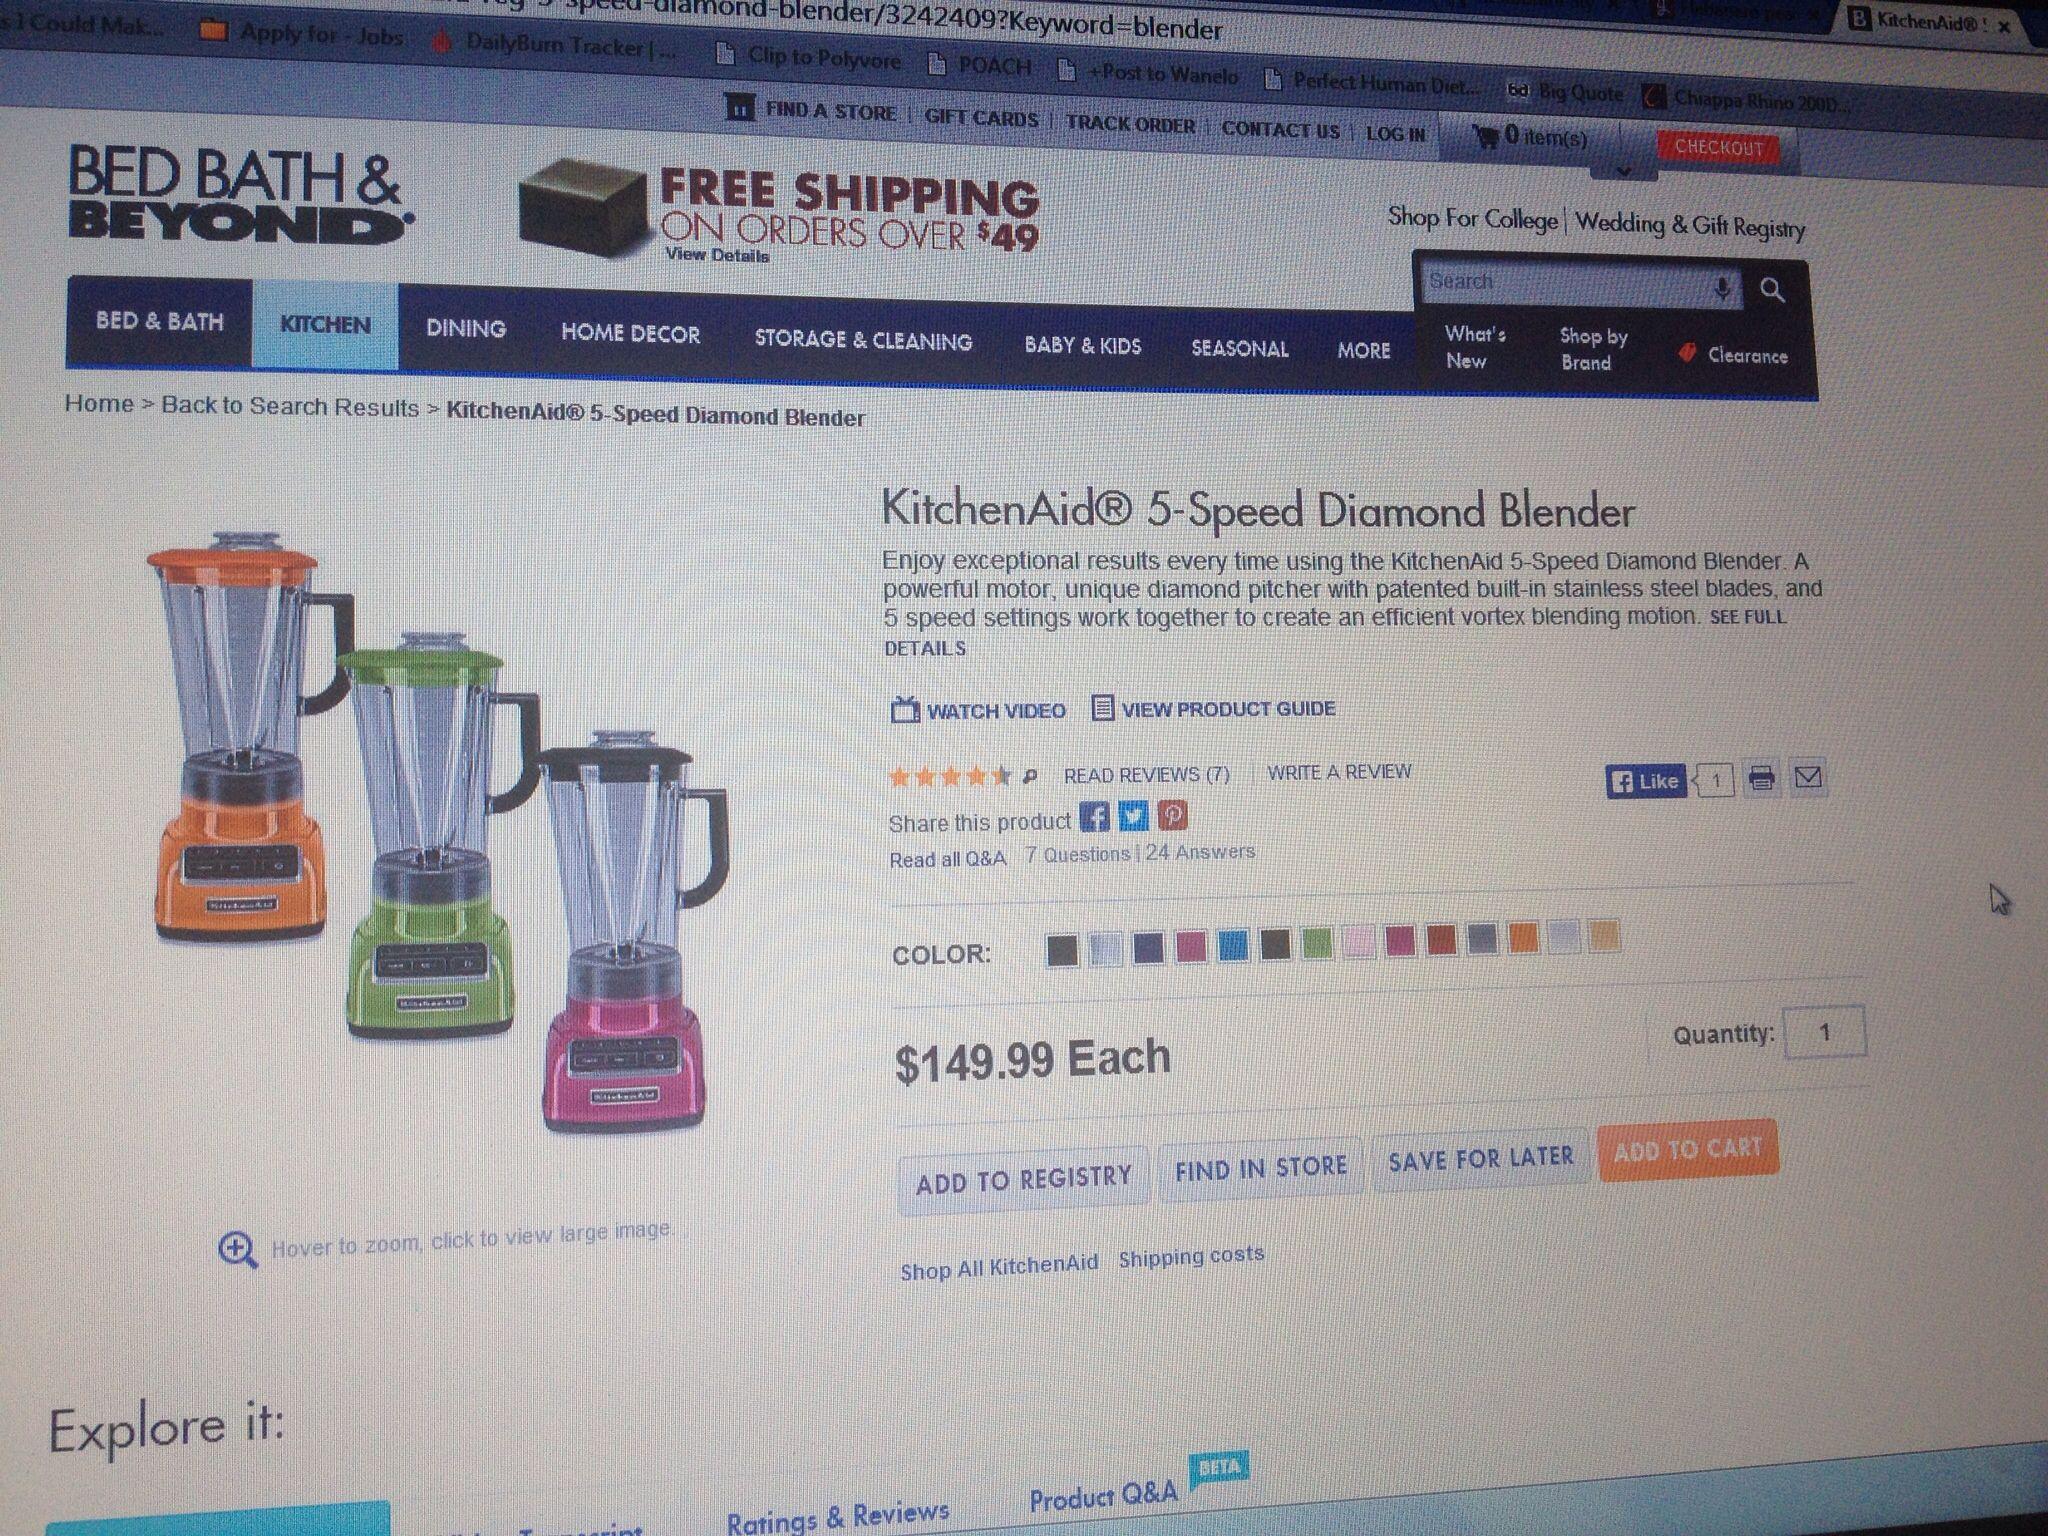 Kitchenaid blender at bbb put that 20 discount to good